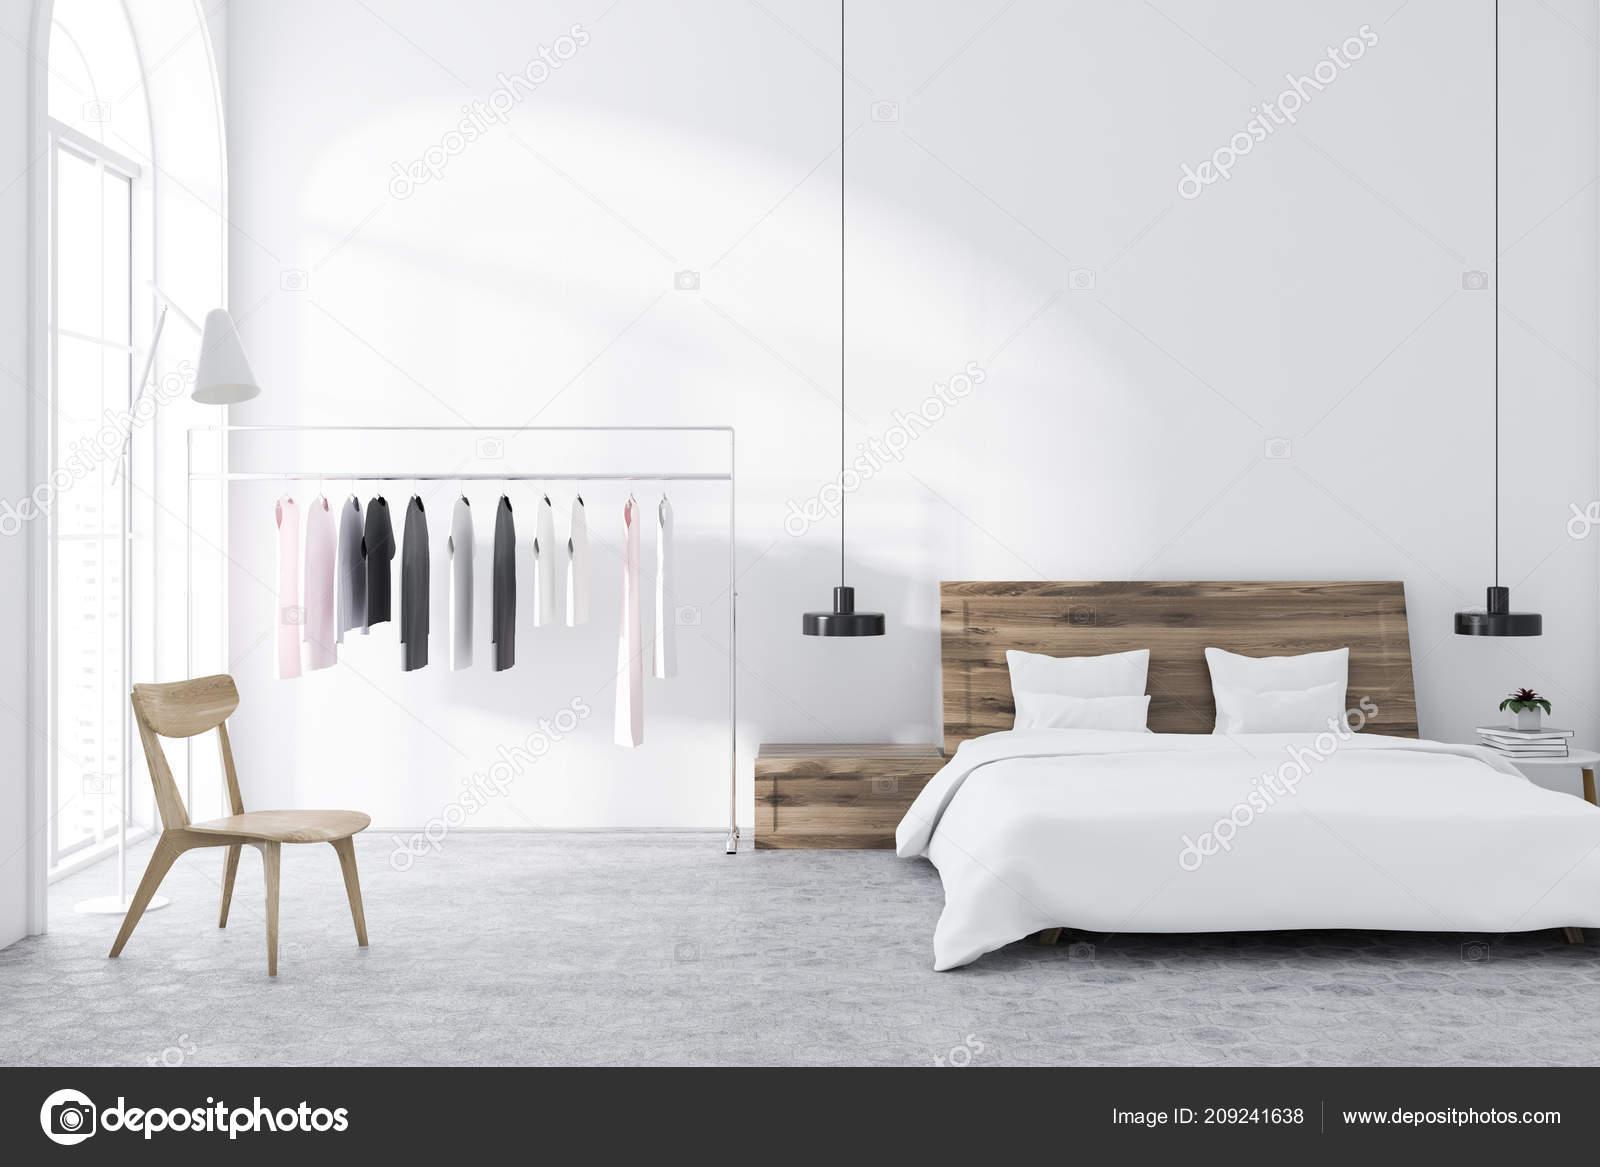 Scandinavian Style Bedroom White Walls Tiled Floor Clothes ...